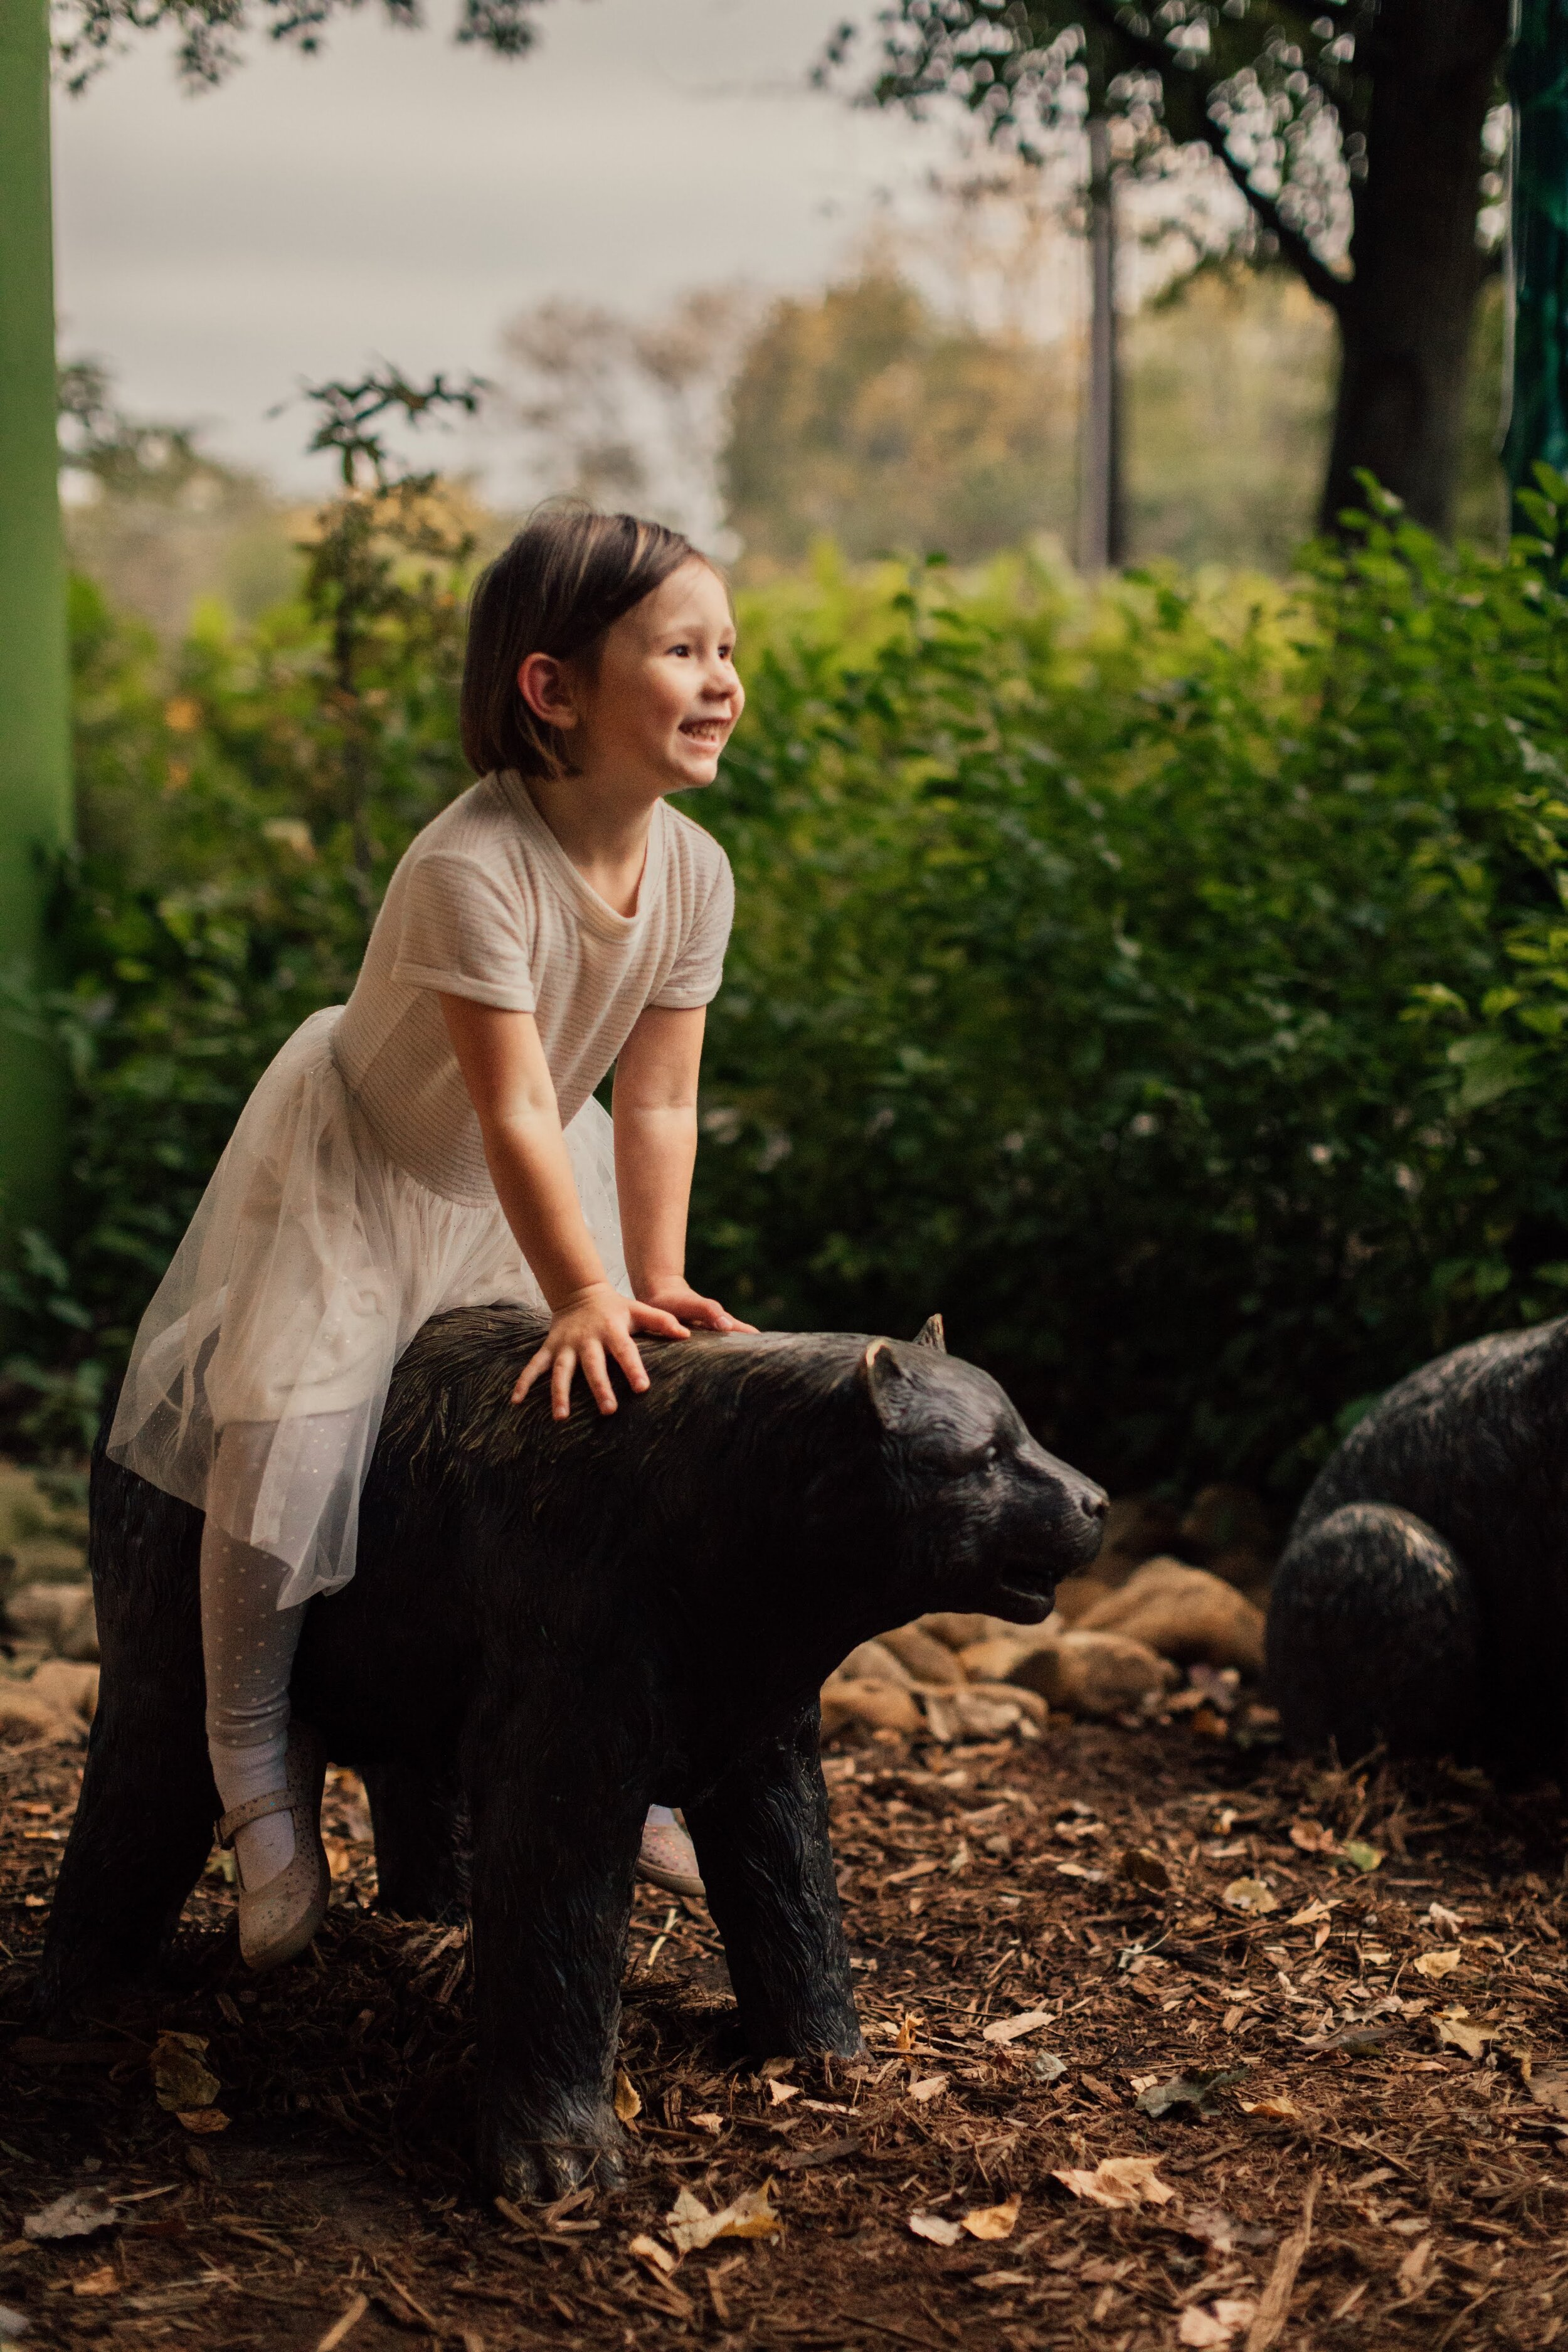 2019-10-29 Fields Family - Greenville, SC - Jack Robert Photography (28 of 158).jpg